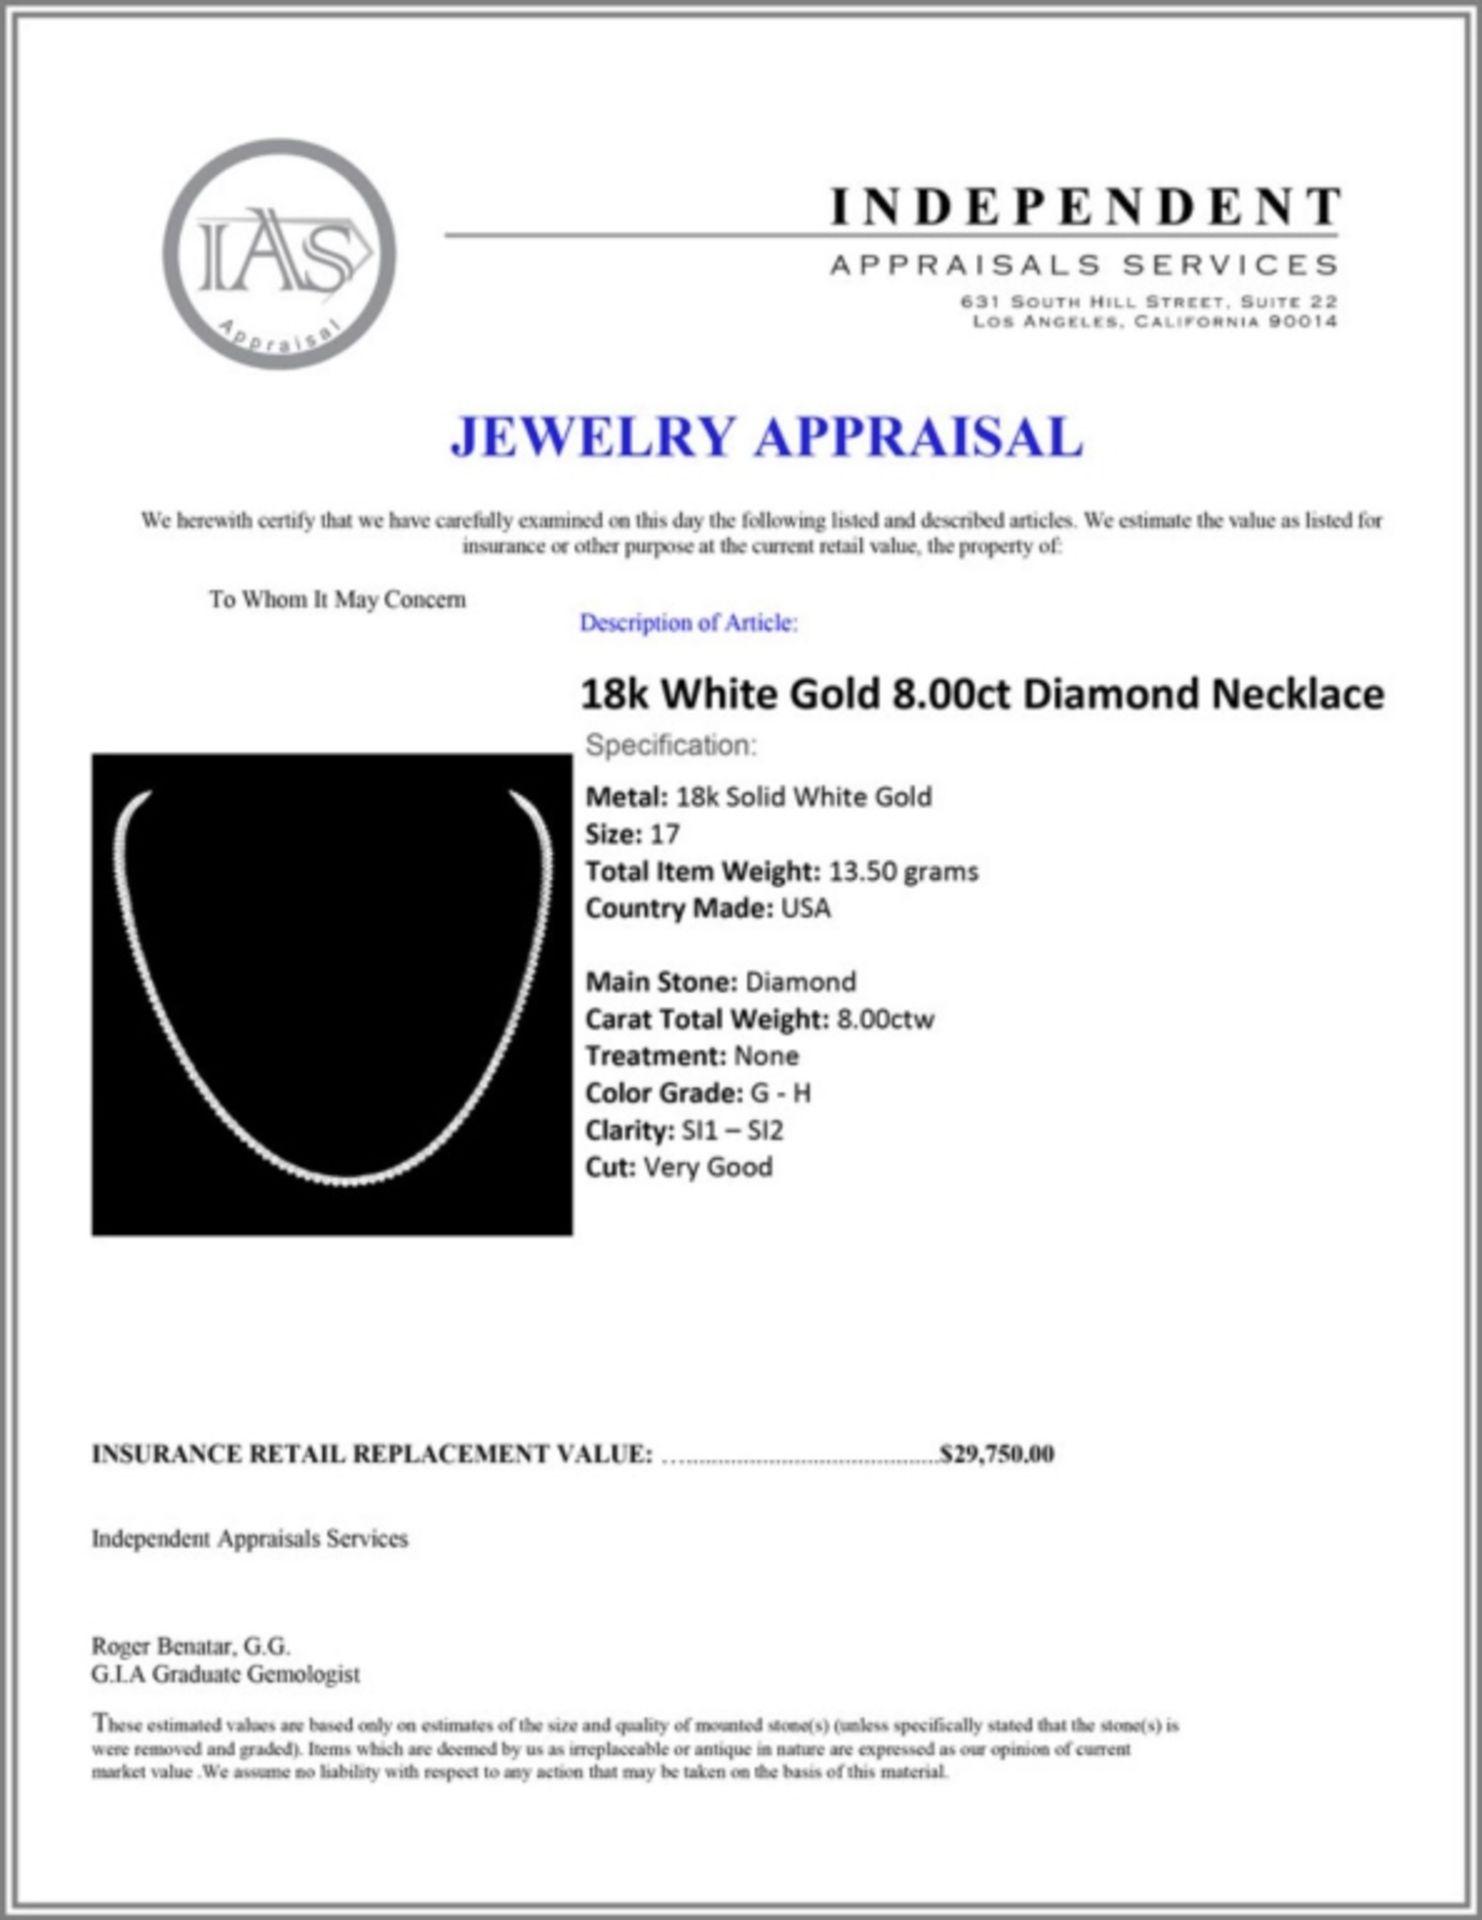 ^18k White Gold 8.00ct Diamond Necklace - Image 4 of 4